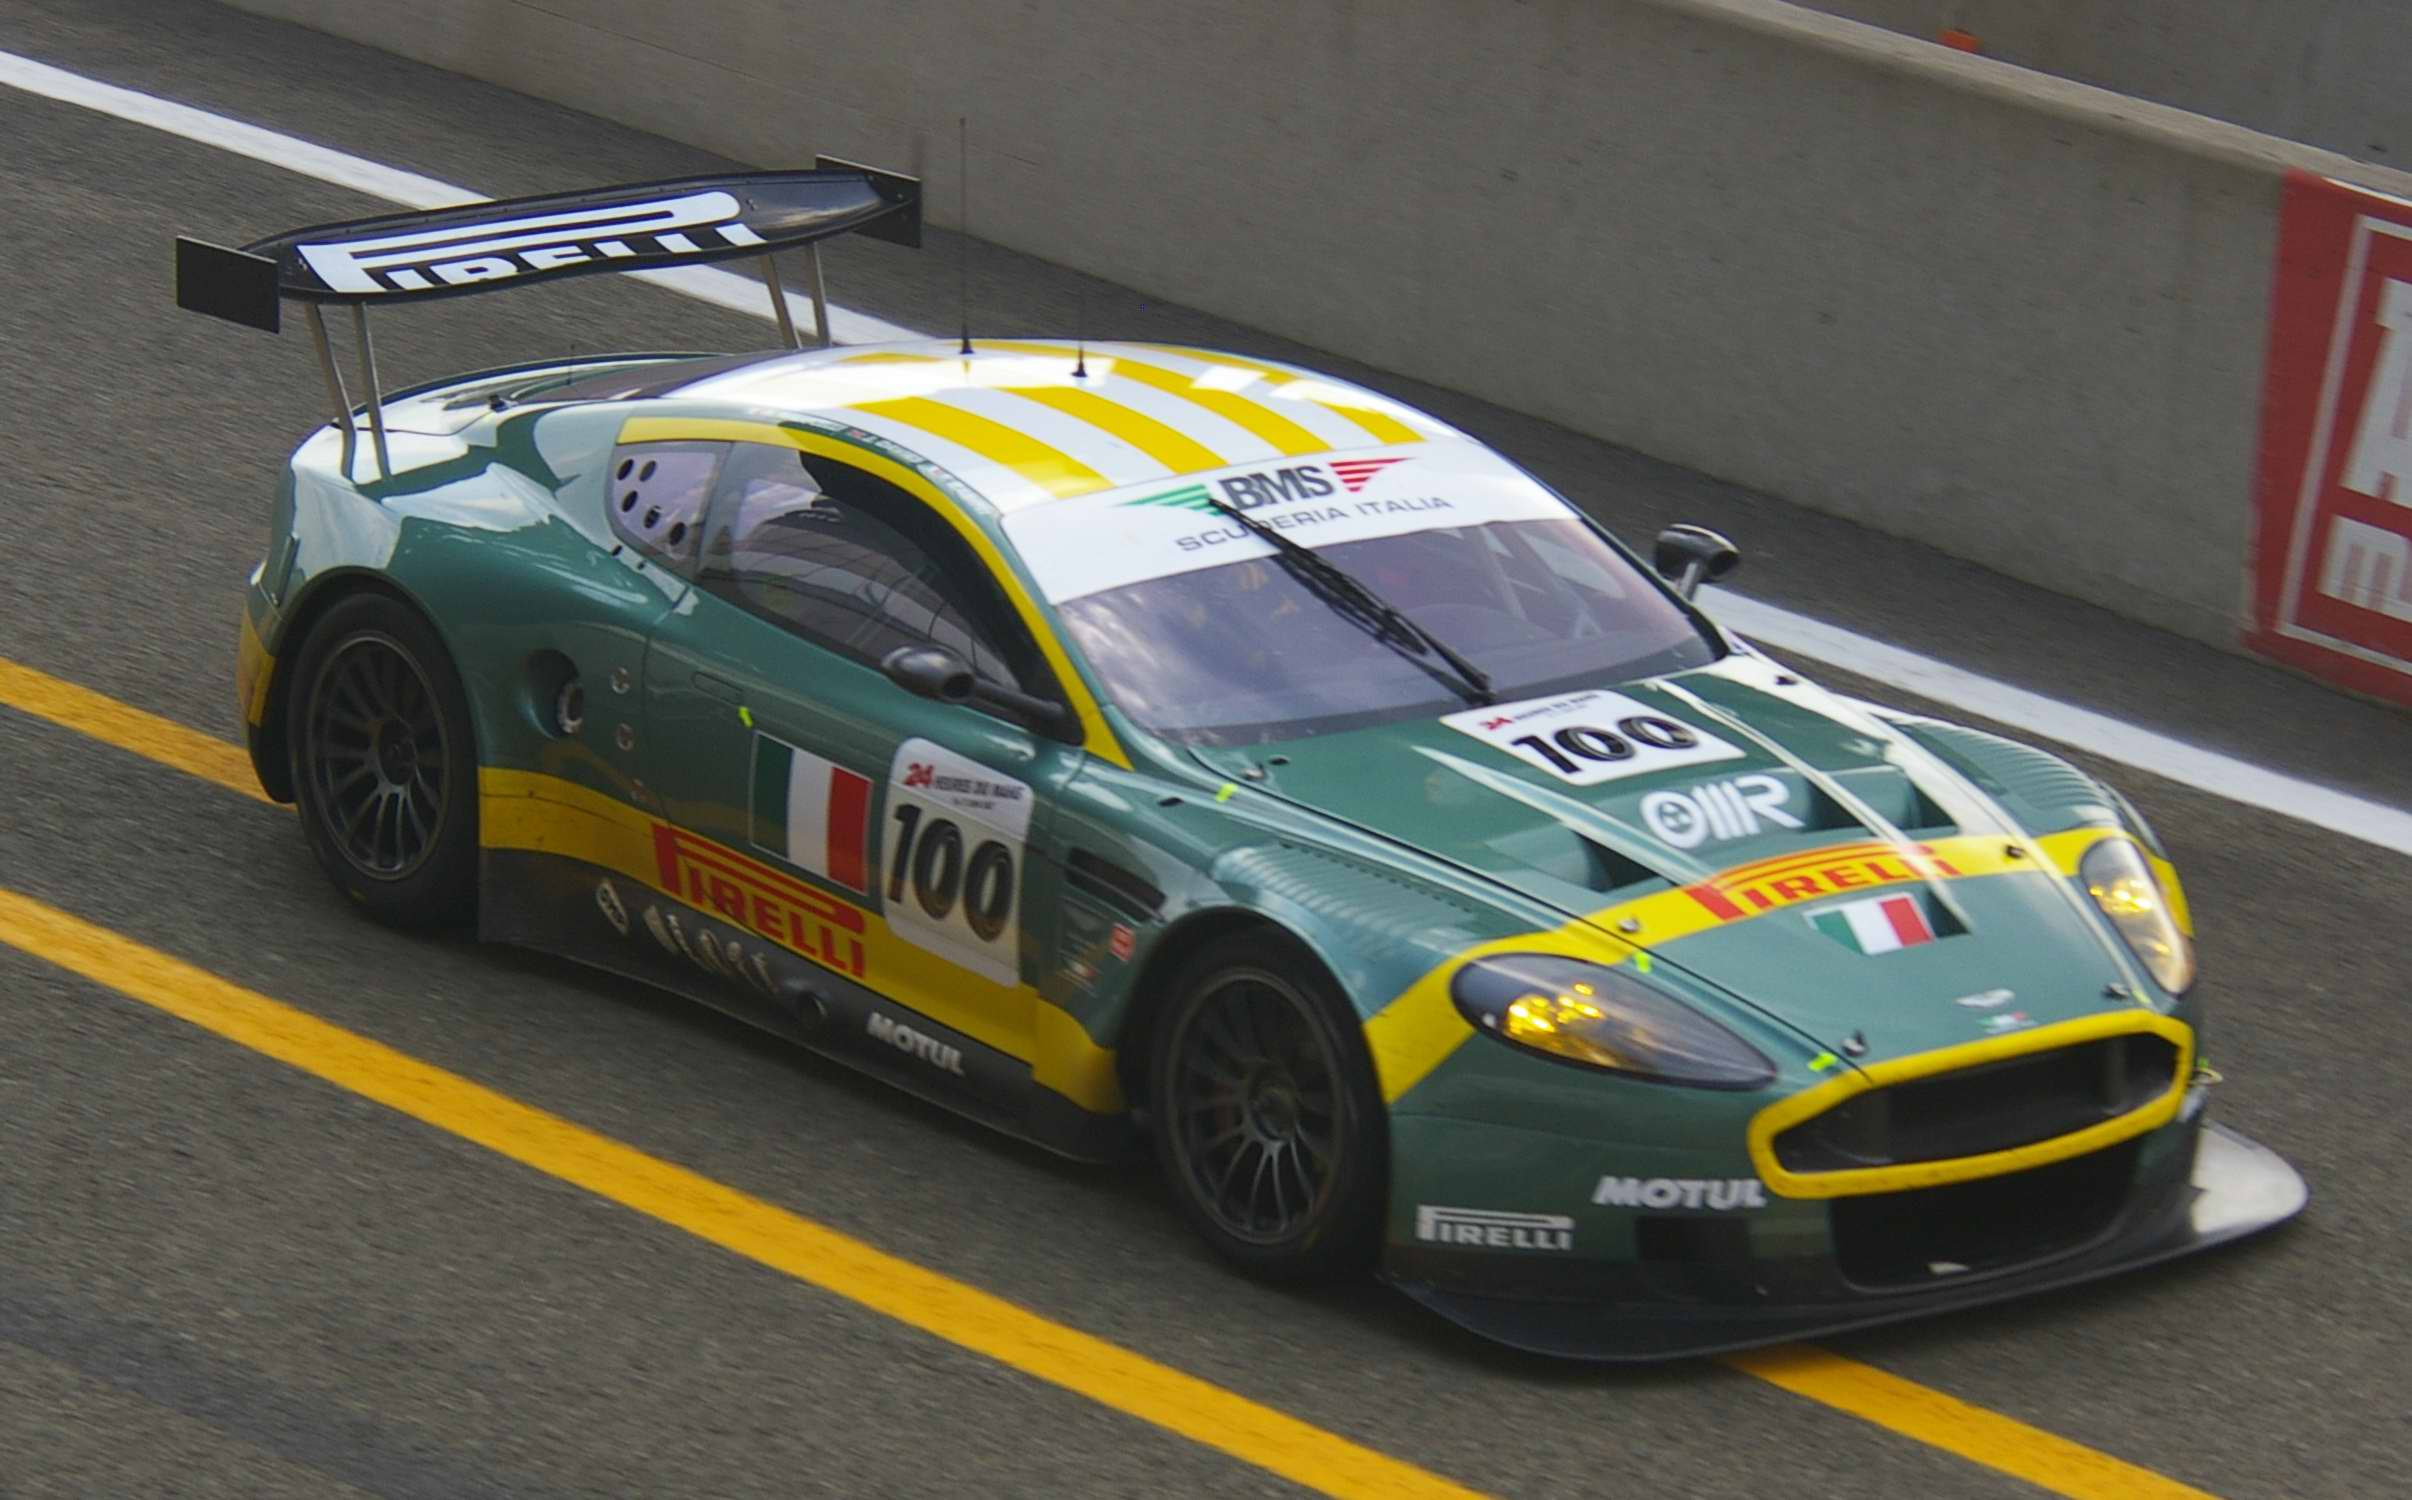 Aston_Martin_DBR9_24h200703.JPG